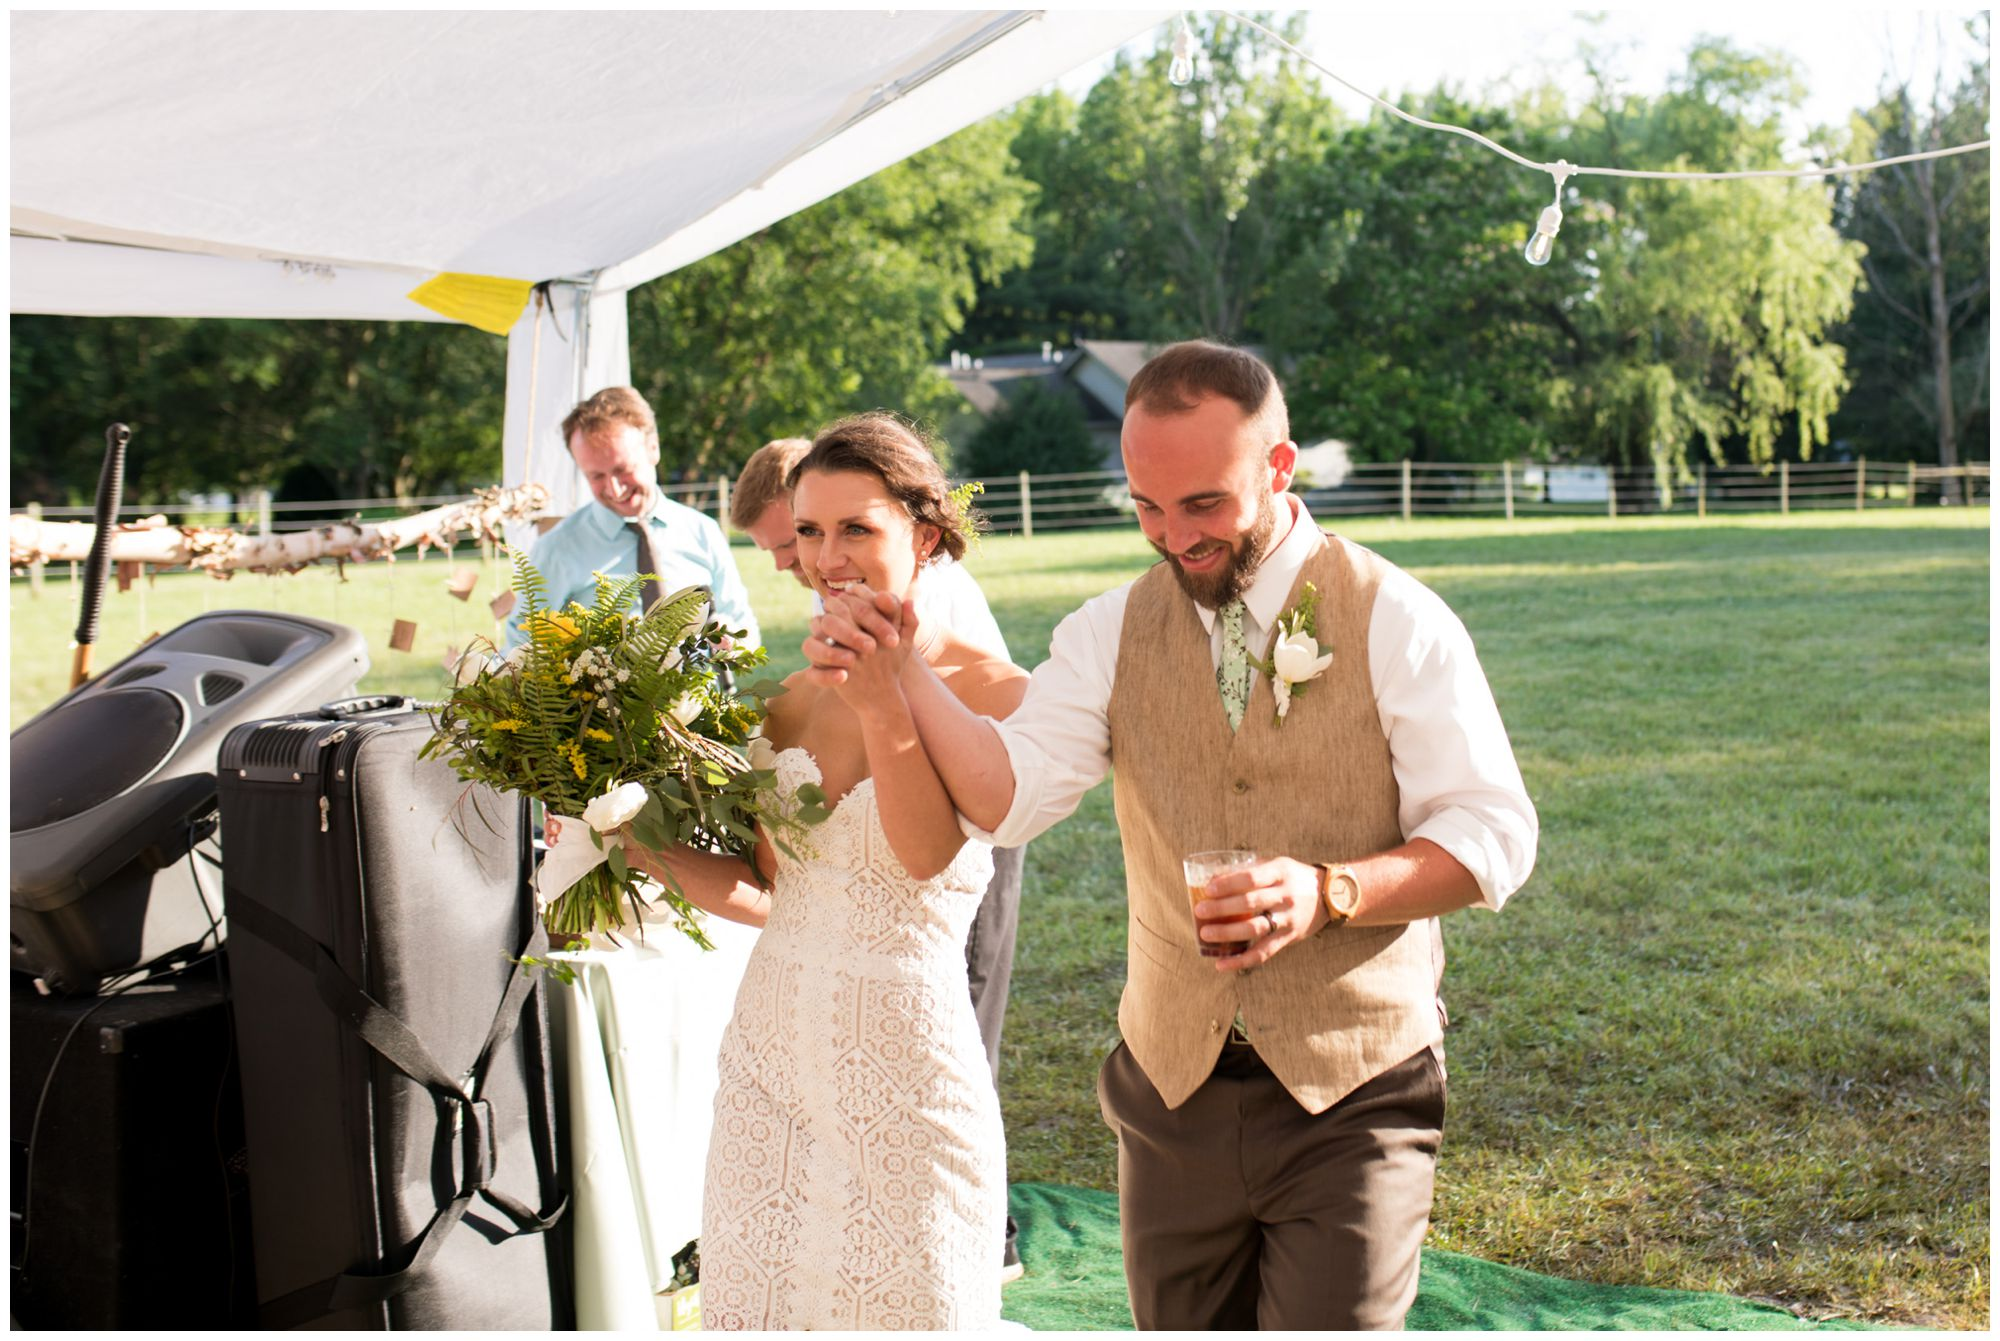 bride and groom walk hand in hand entering Indianapolis tented wedding reception